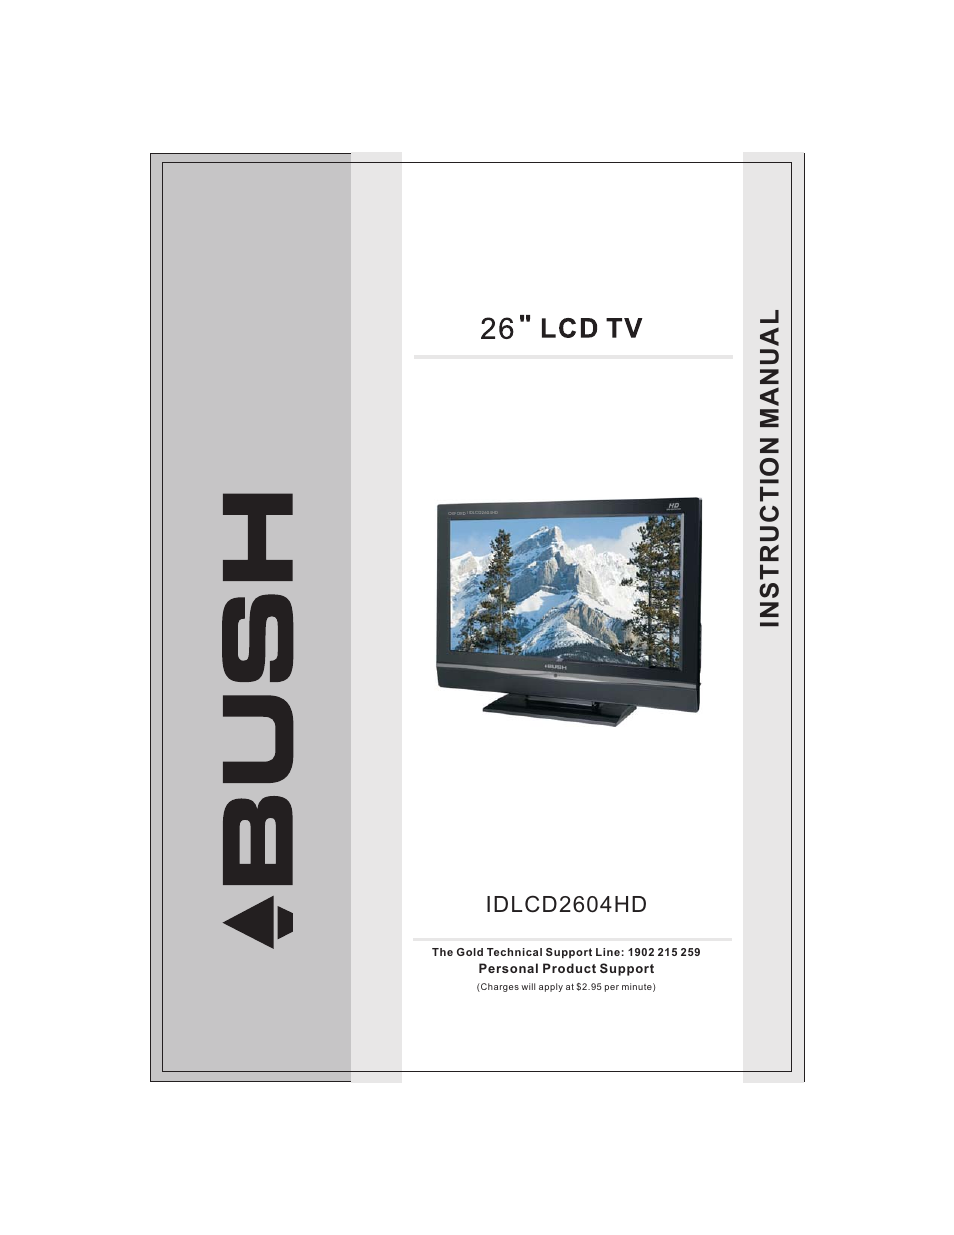 bush 26 lcd tv idlcd2604hd user manual 24 pages rh manualsdir com bush tv manual buttons bush tv manual retune